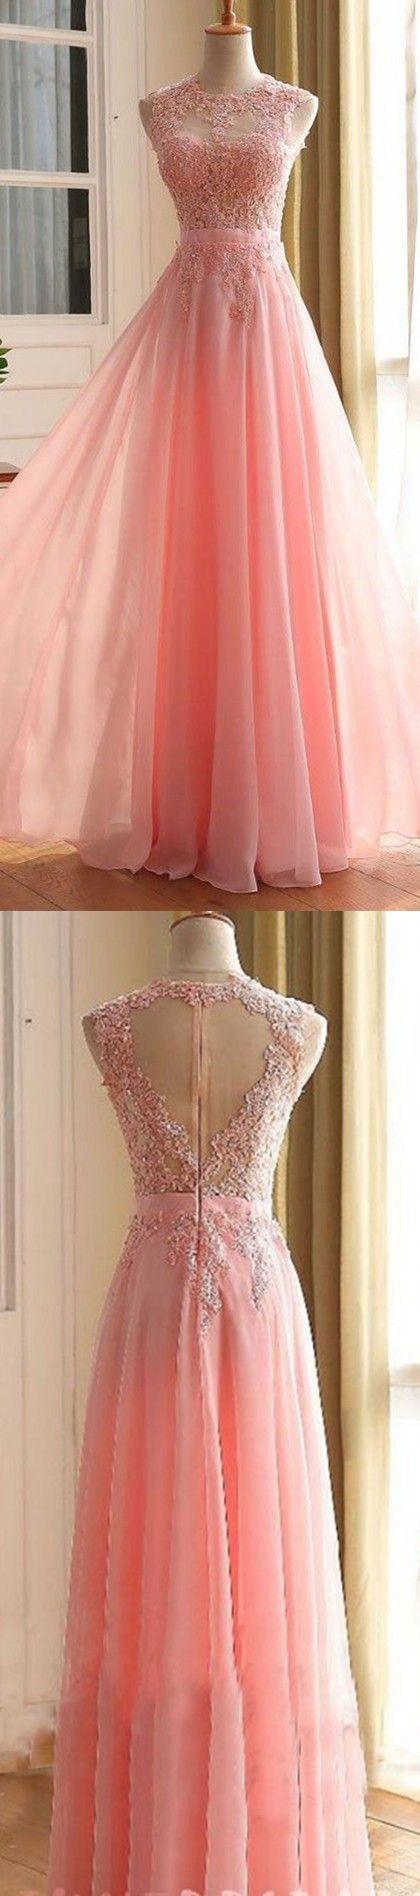 F26 Sexy Sleeveless Prom Dress, Appliques Prom Dresses,Long Evening ...